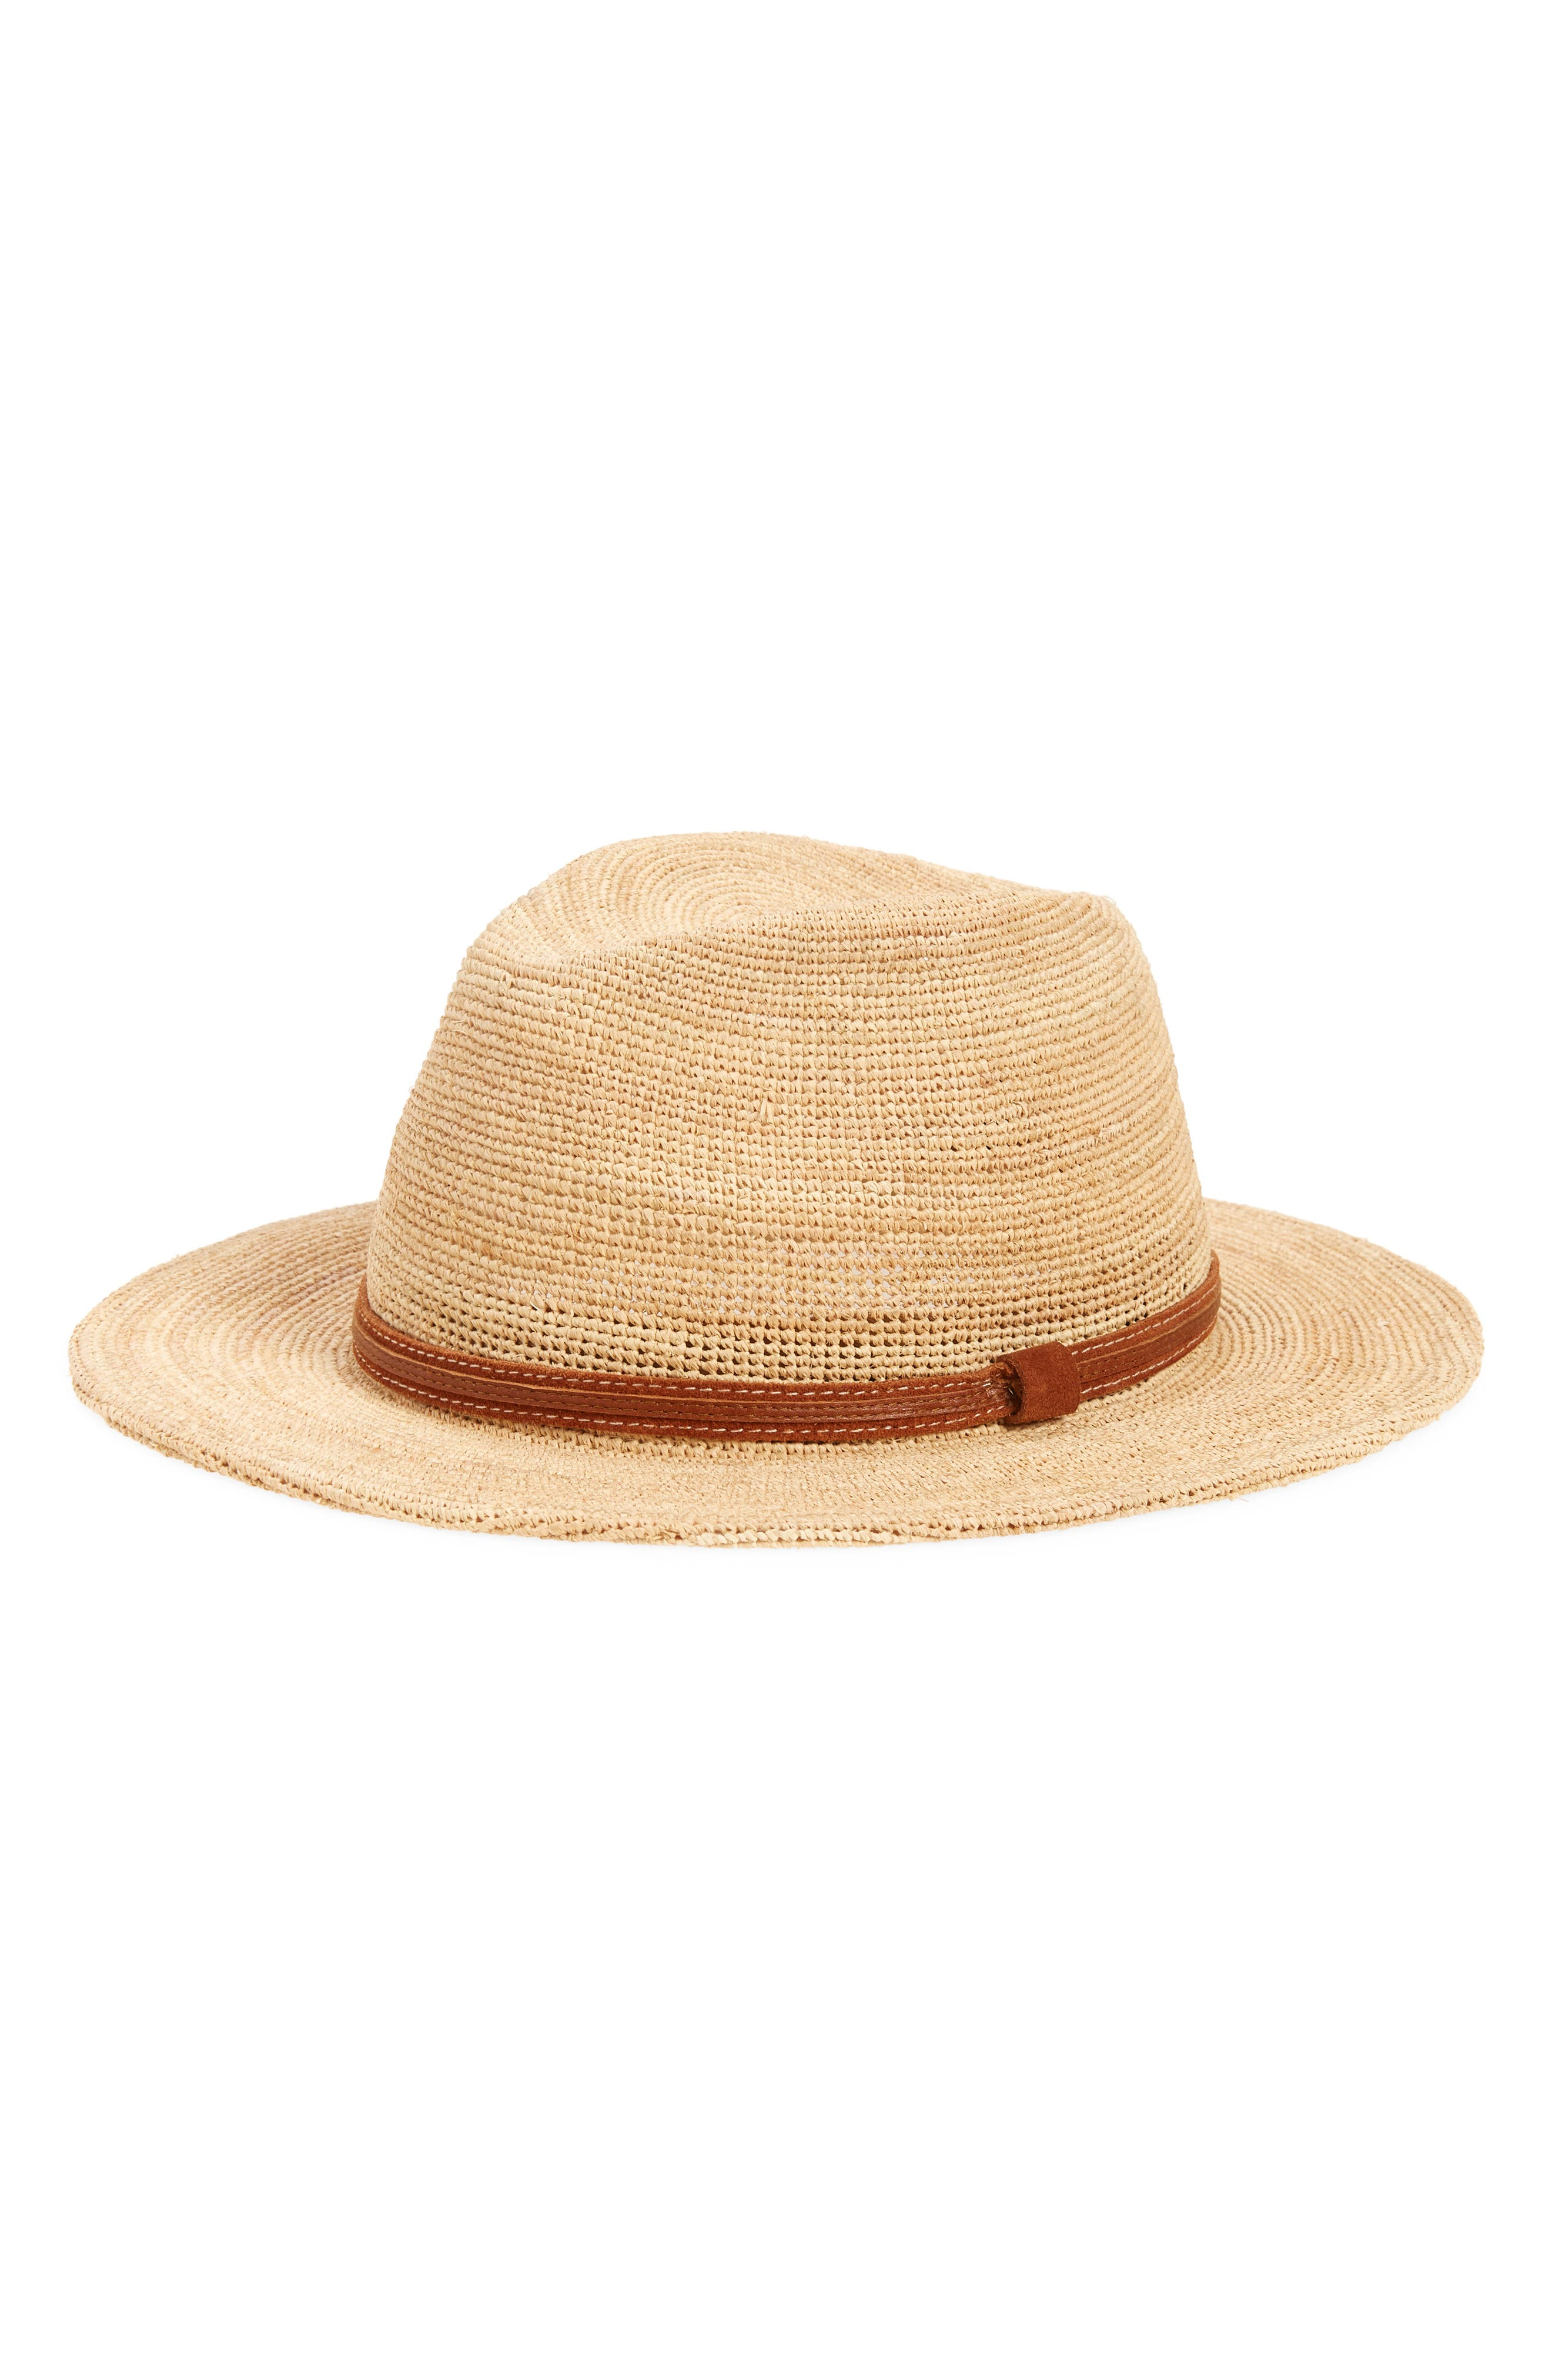 . Super Lemon Straw Hat